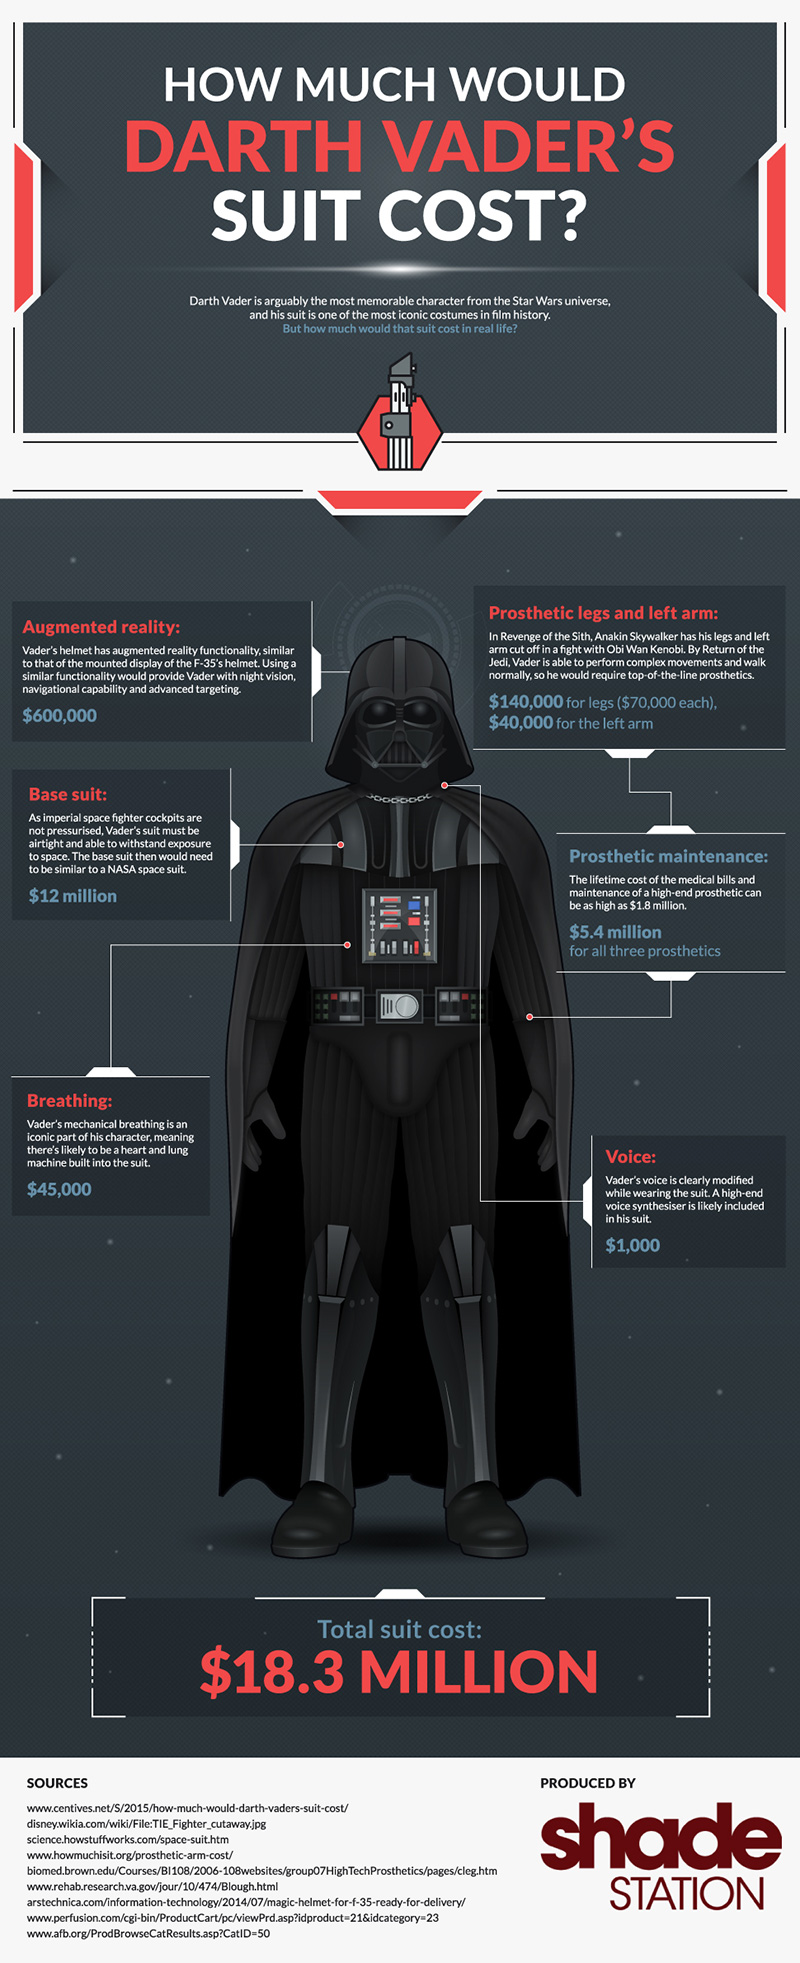 Darth Vader's Suit